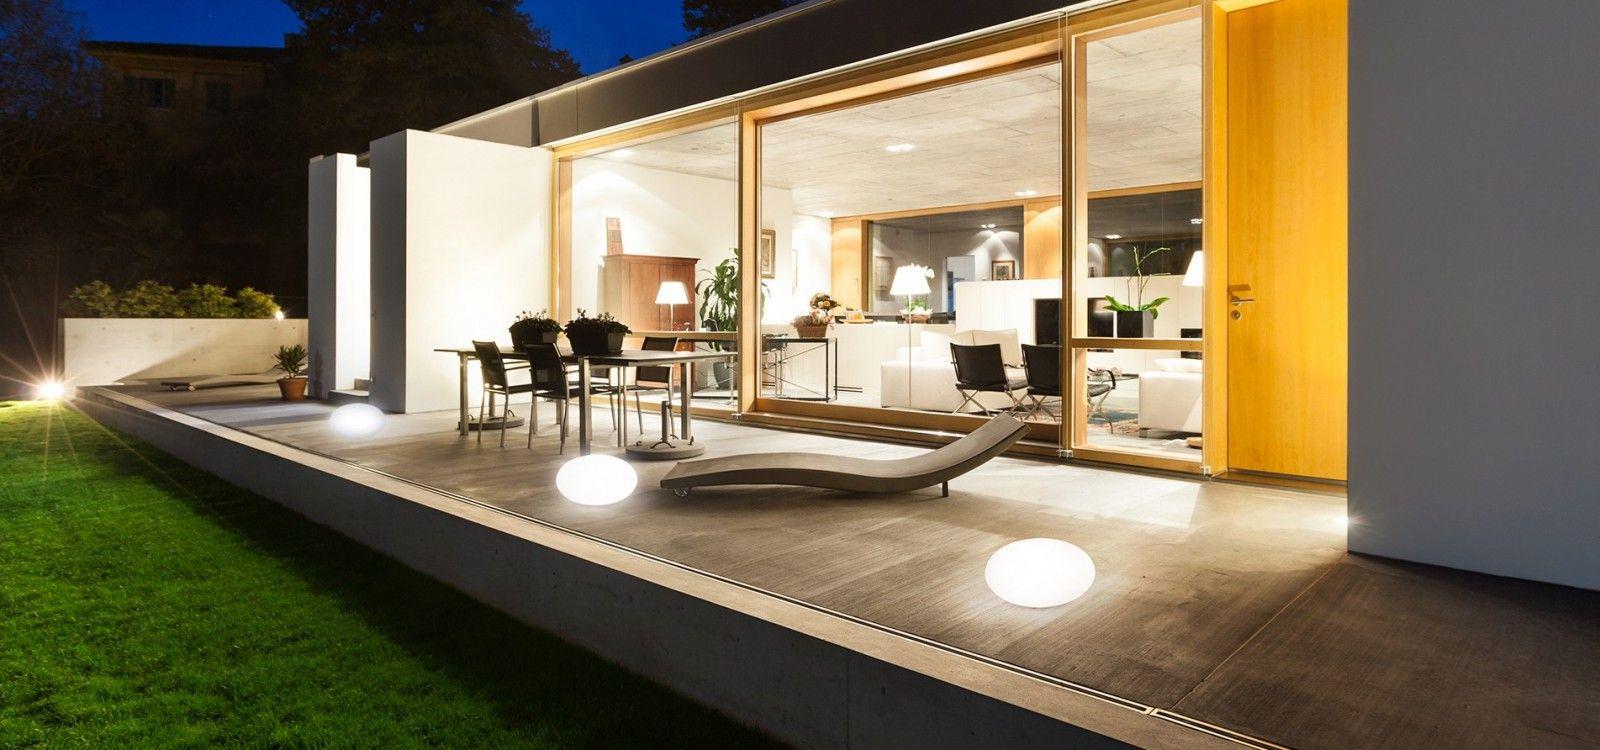 Lampa Magic Oval Prod Garden Lights Lampy Ogrodowe